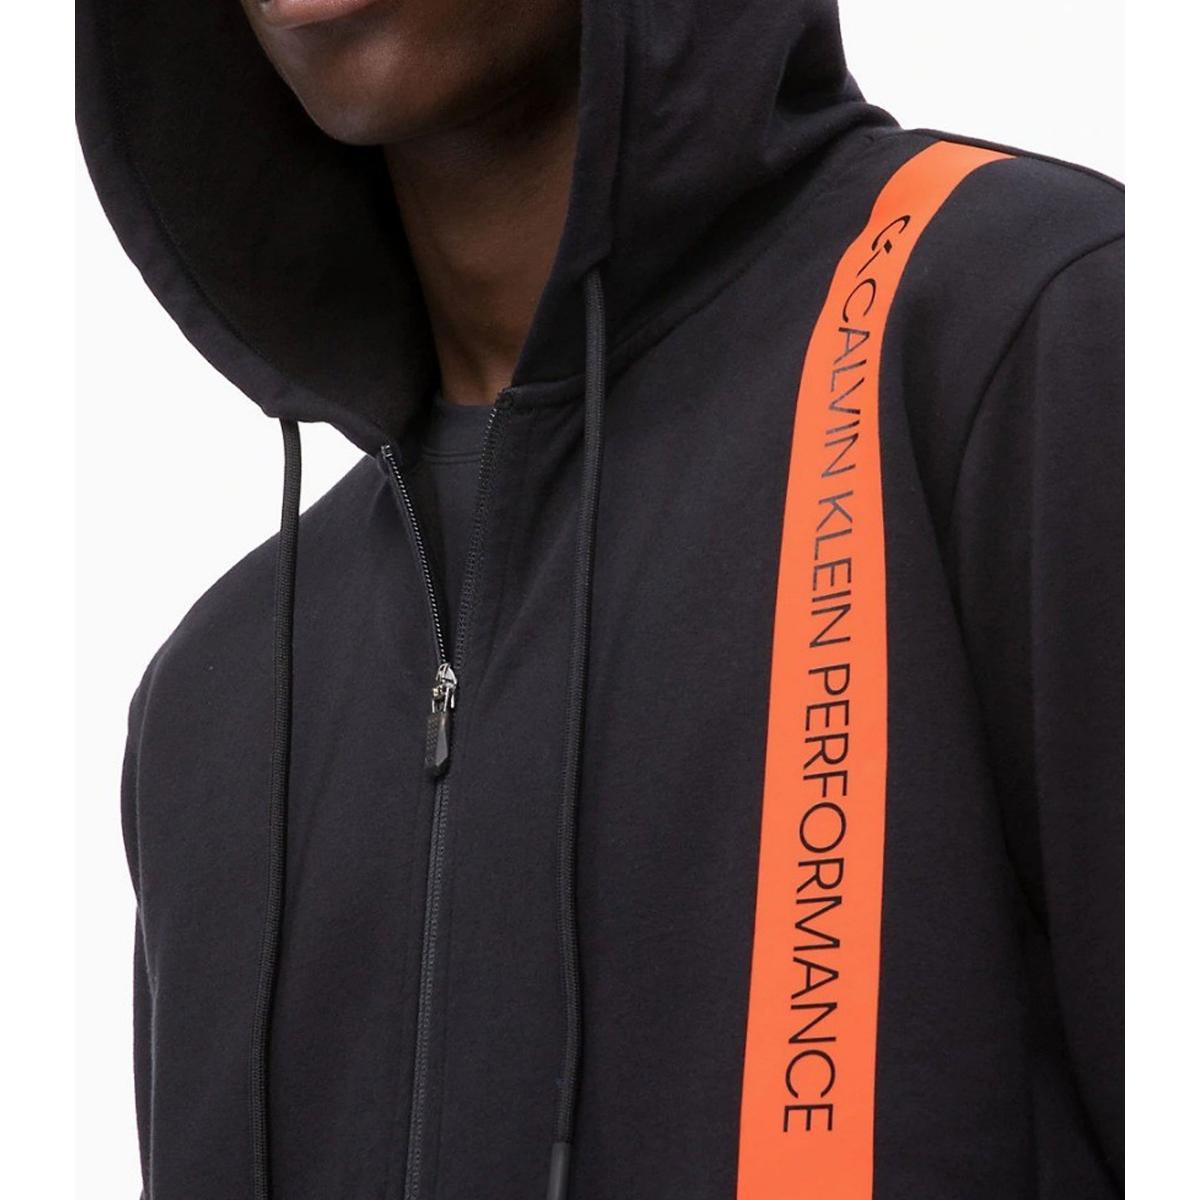 Felpa Calvin Klein Performance con cappuccio e zip da uomo rif. 00GMH8J421